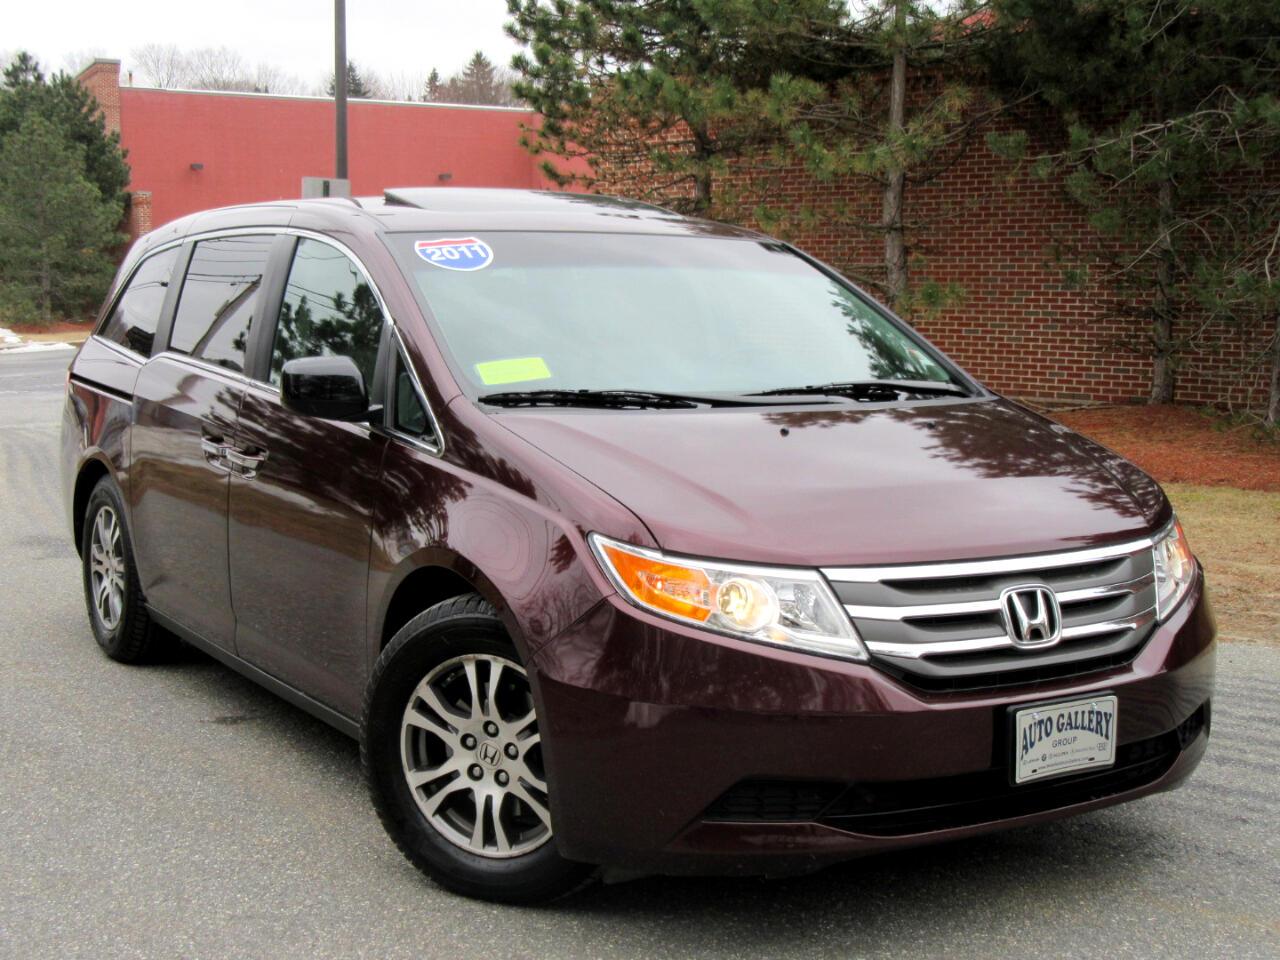 2011 Honda Odyssey 5 dr EX-L w/Navigation Backup Camera 8 Seating